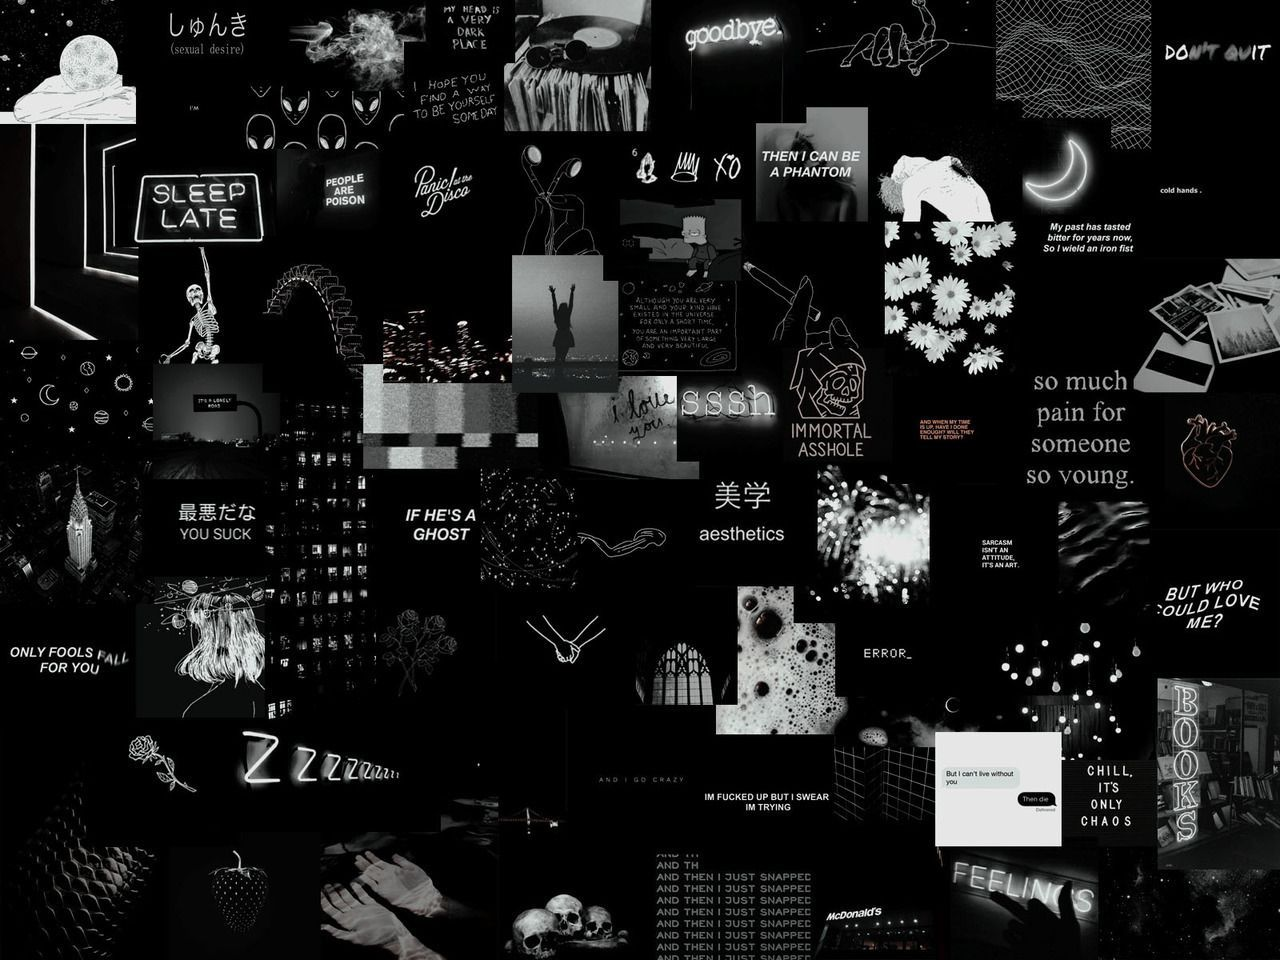 Pin oleh TheFadedLover97 di wallpaper Fotografi abstrak